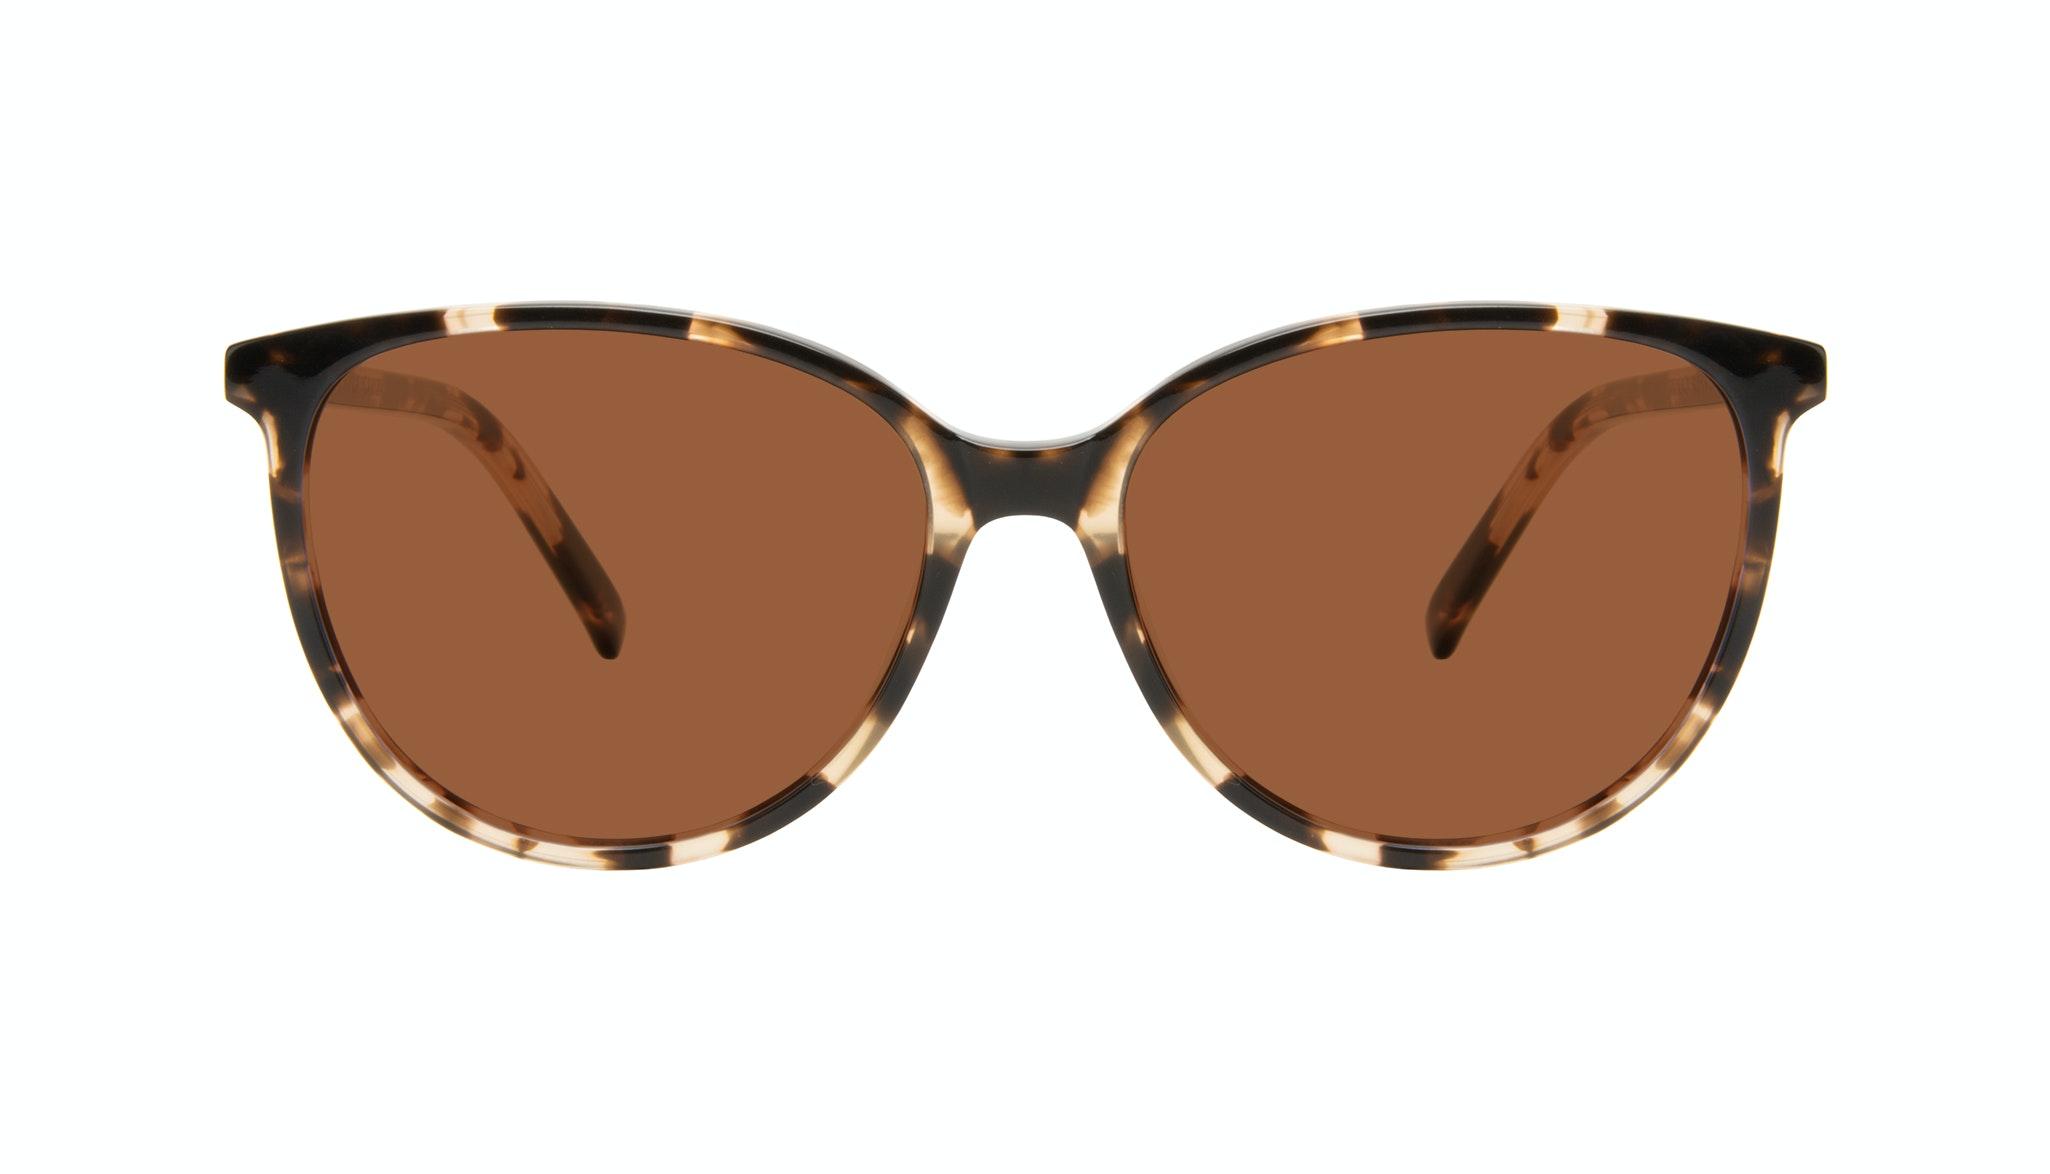 Affordable Fashion Glasses Round Sunglasses Women Imagine Purple Glaze Front